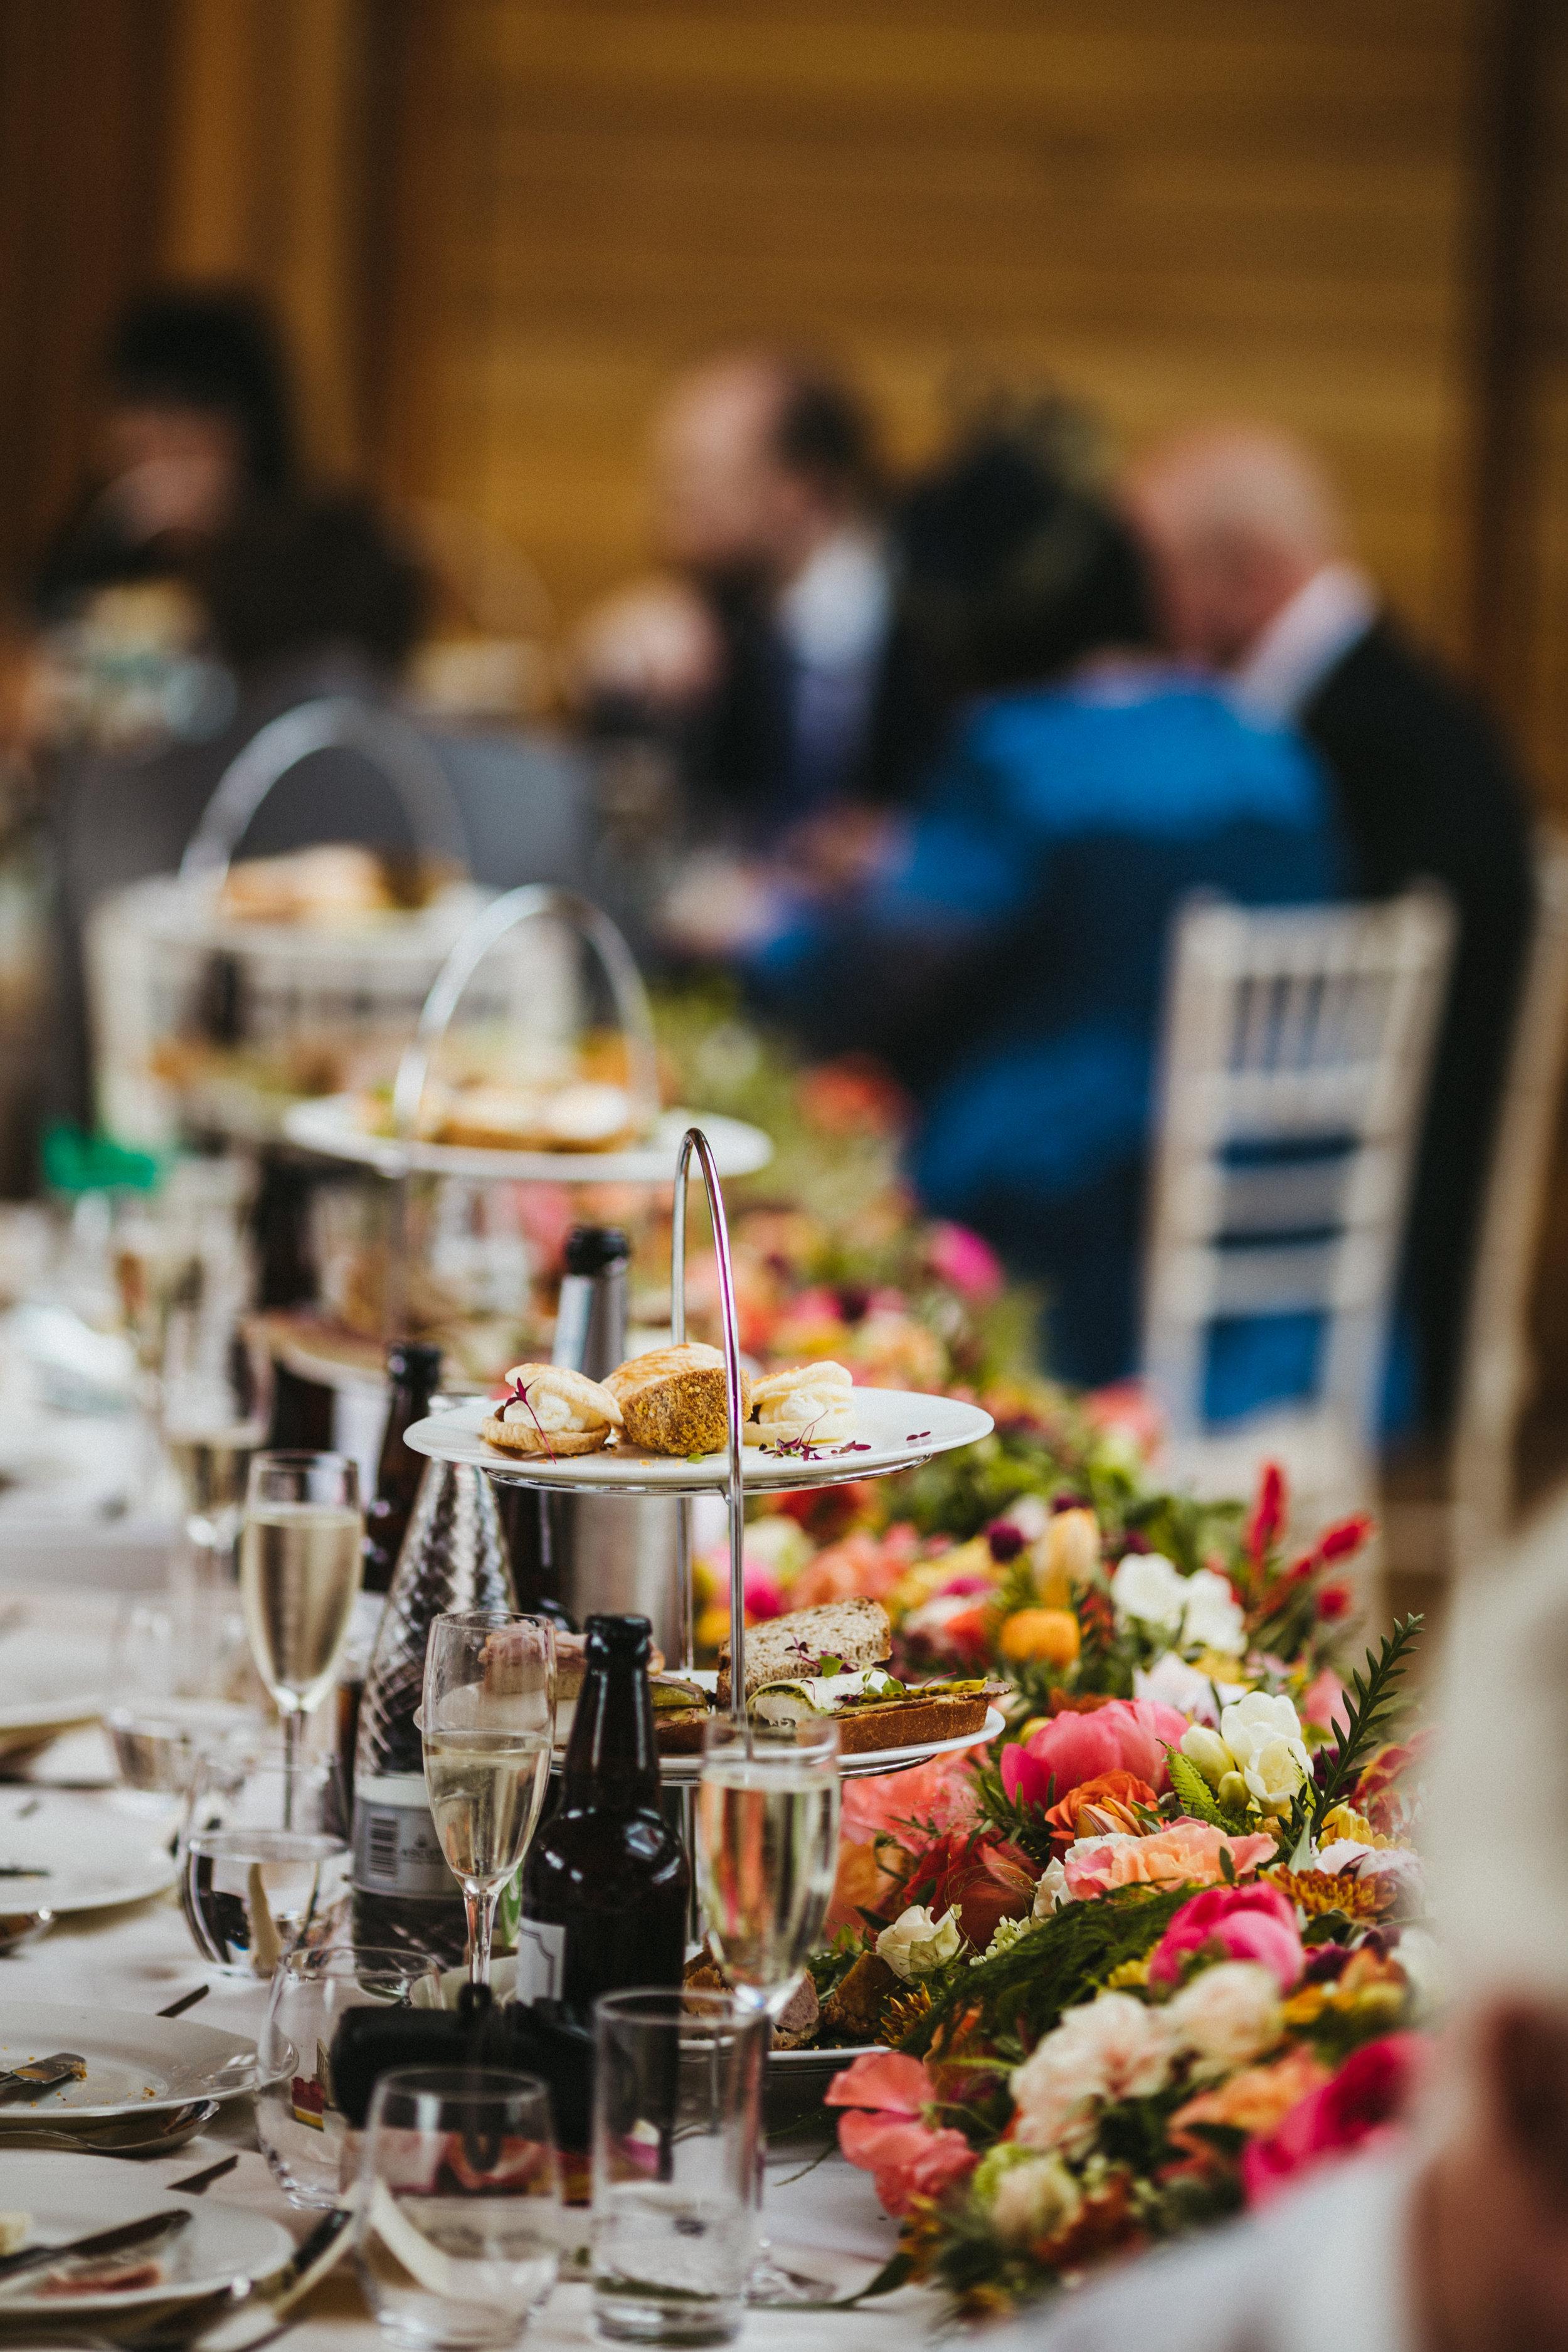 Rosemary and Martin's Wedding - Utopia, Broughton Hall - May 2017